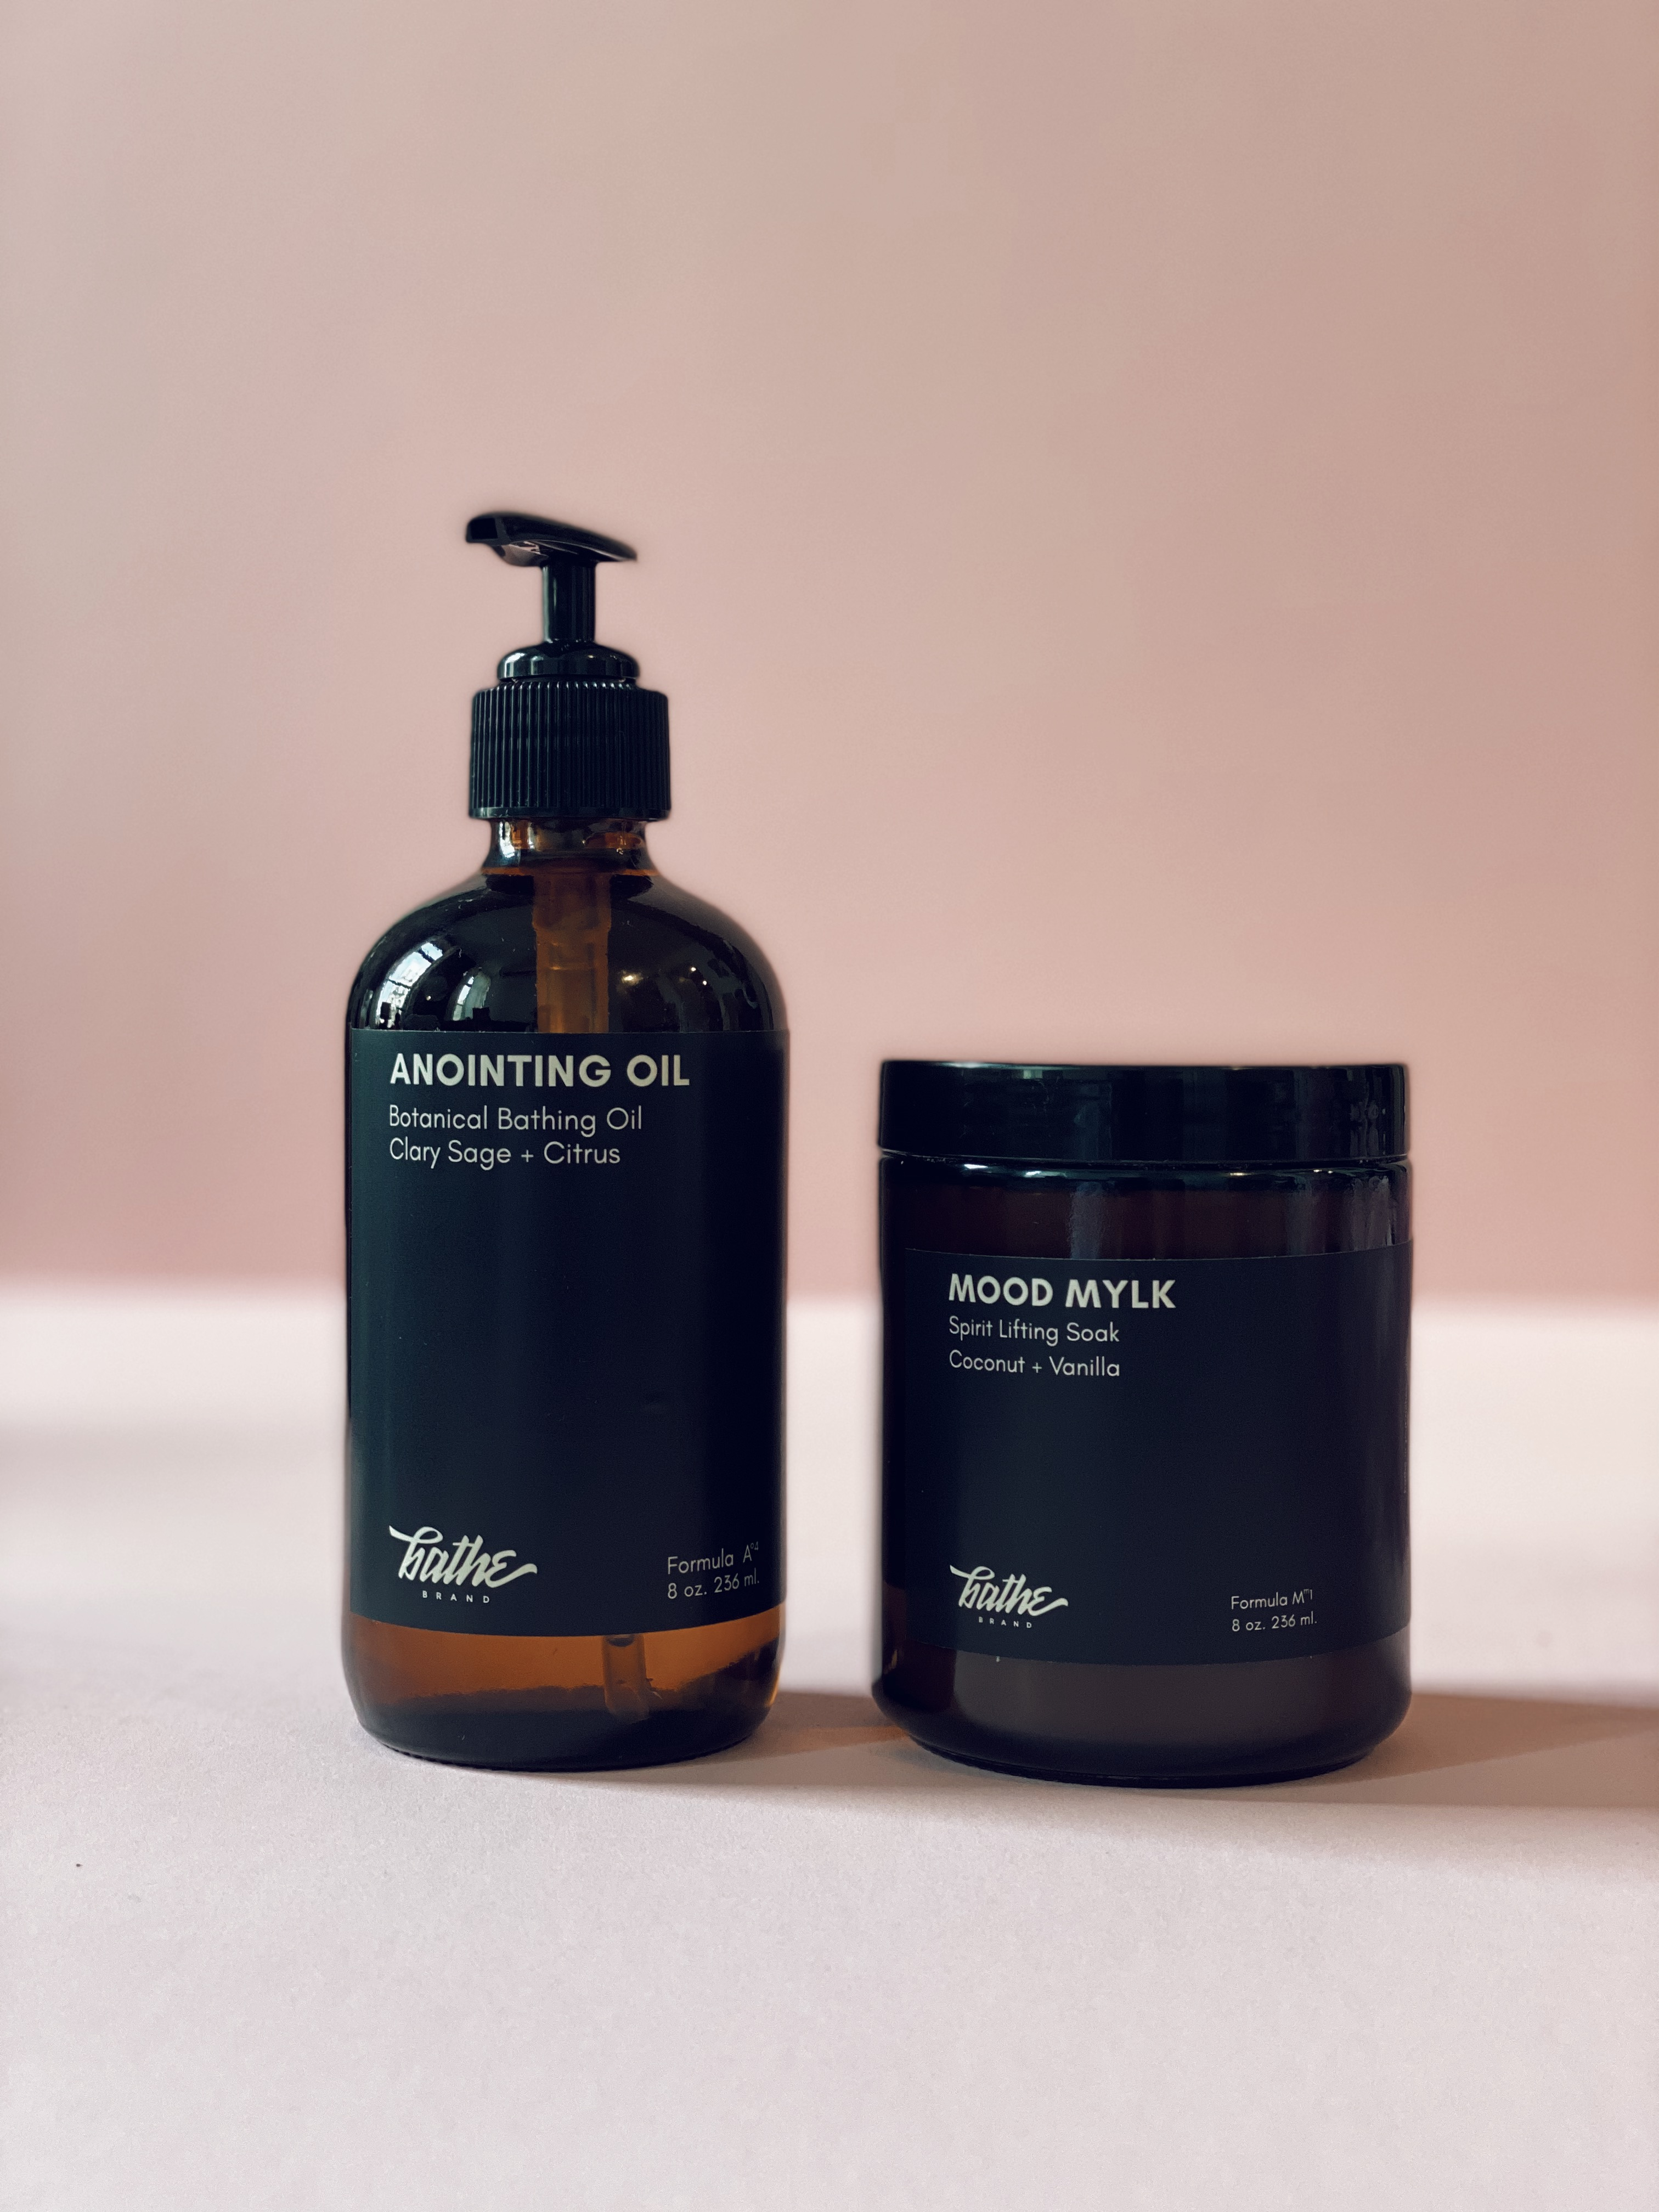 Bathe Brand